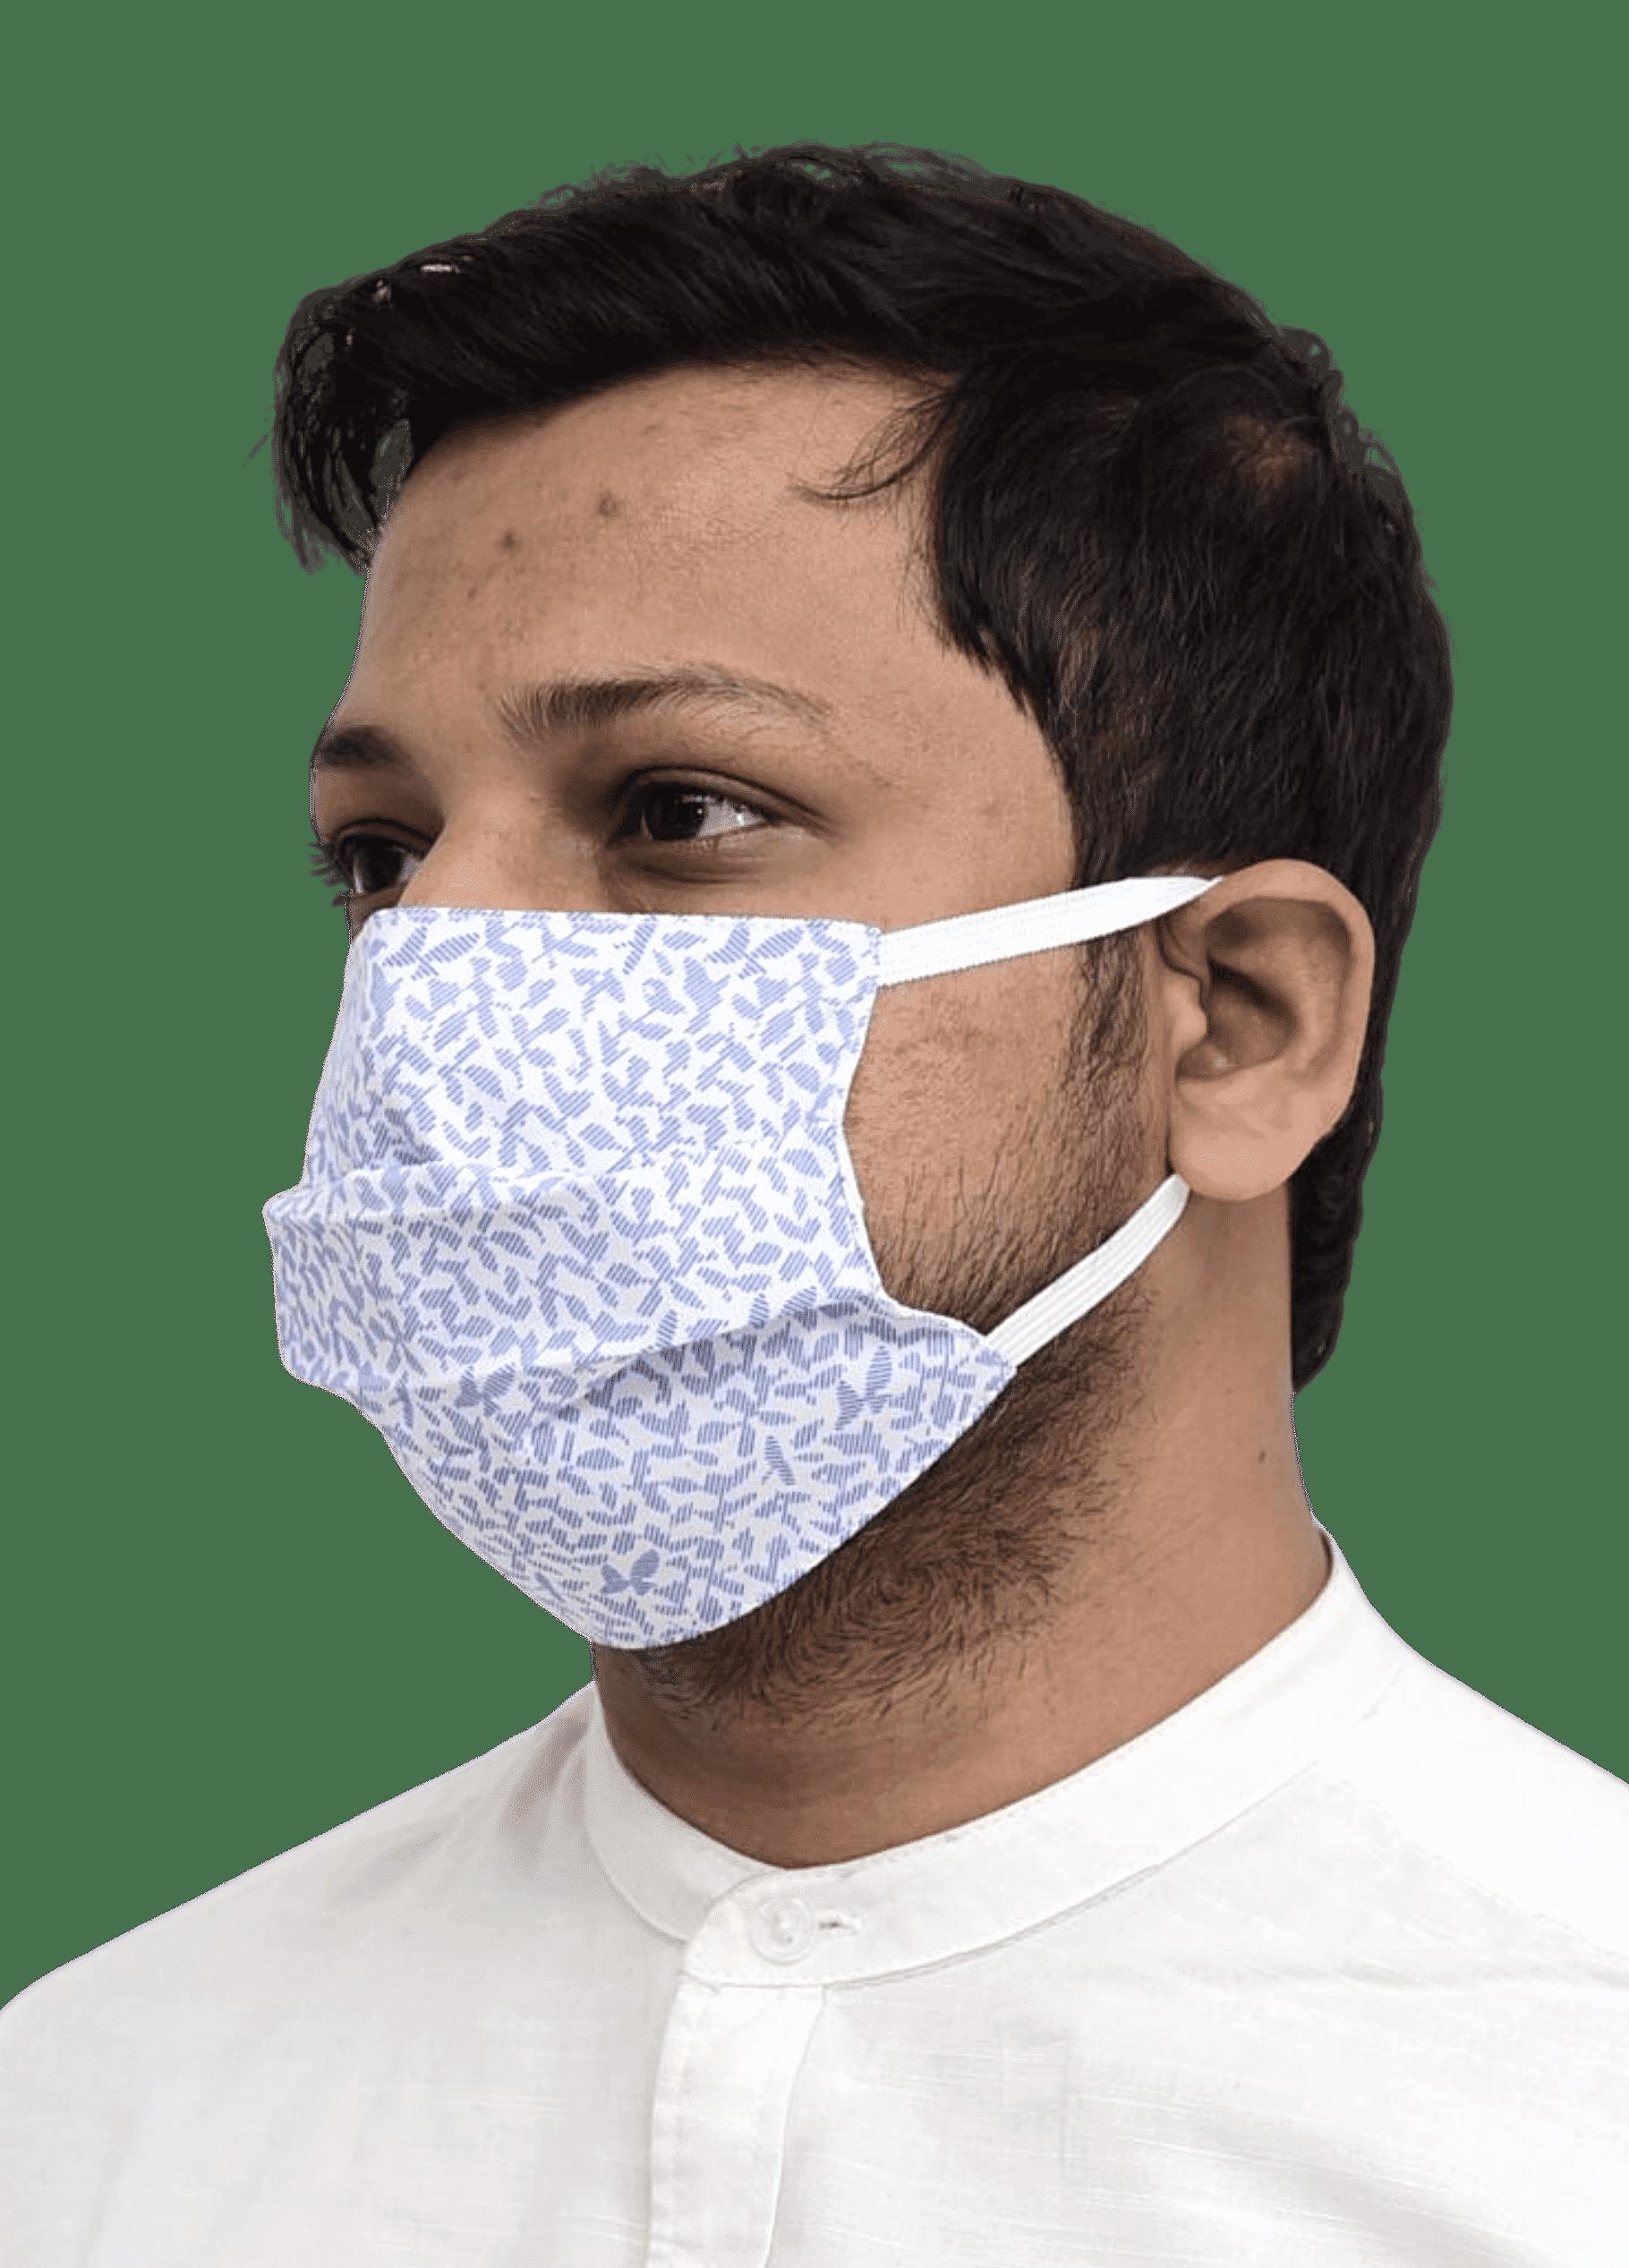 Printed Nanofiber Mask with Elastic